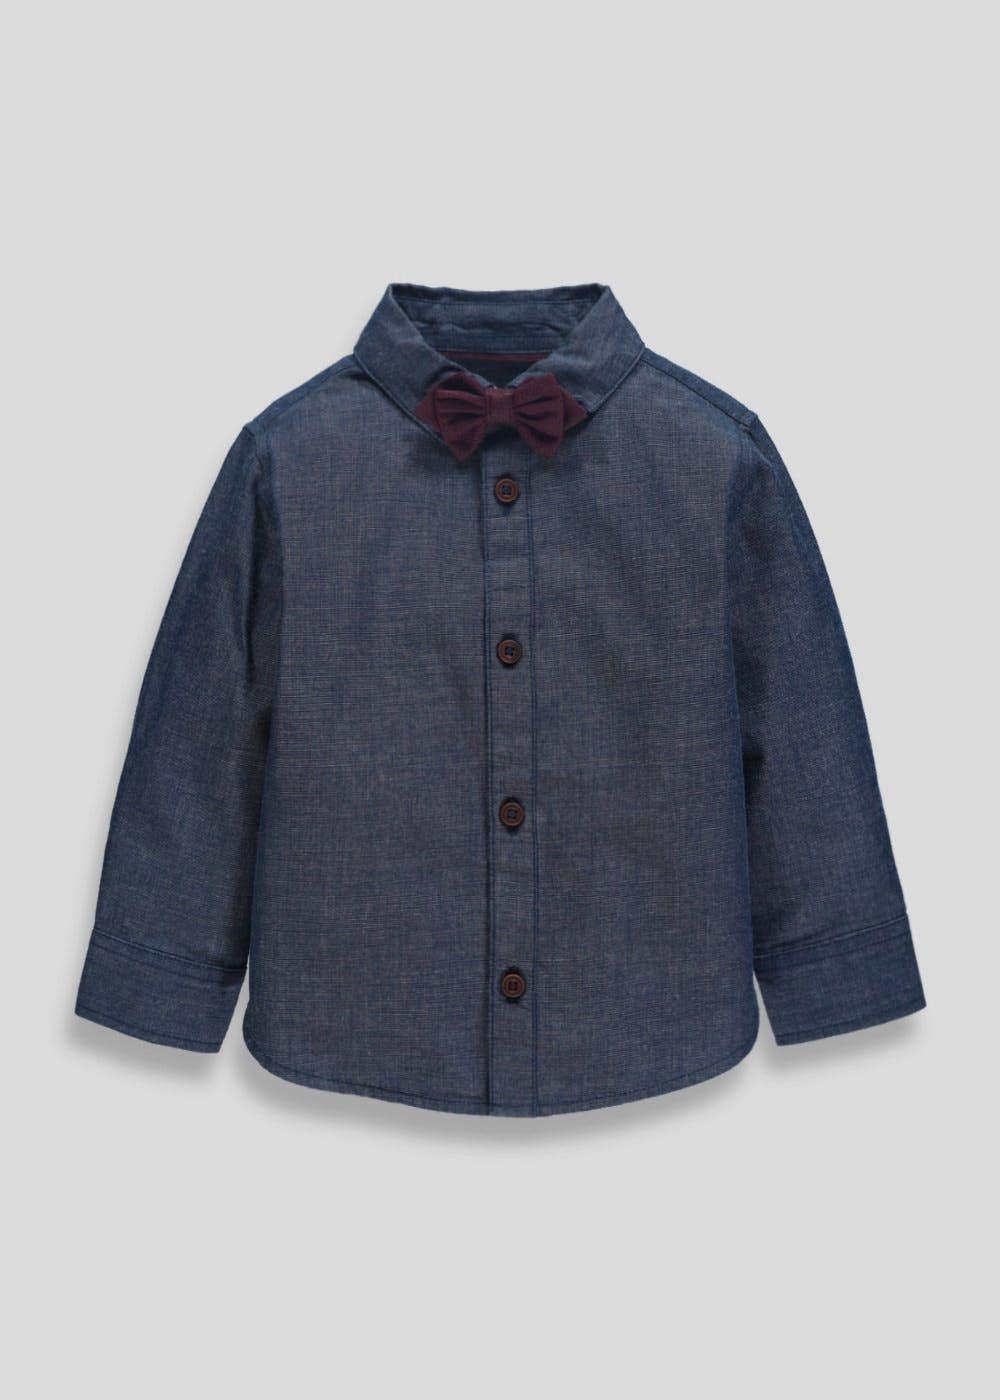 b02990ad Boys Shirt & Bow Tie Set (6mths-6yrs) – Navy – Matalan